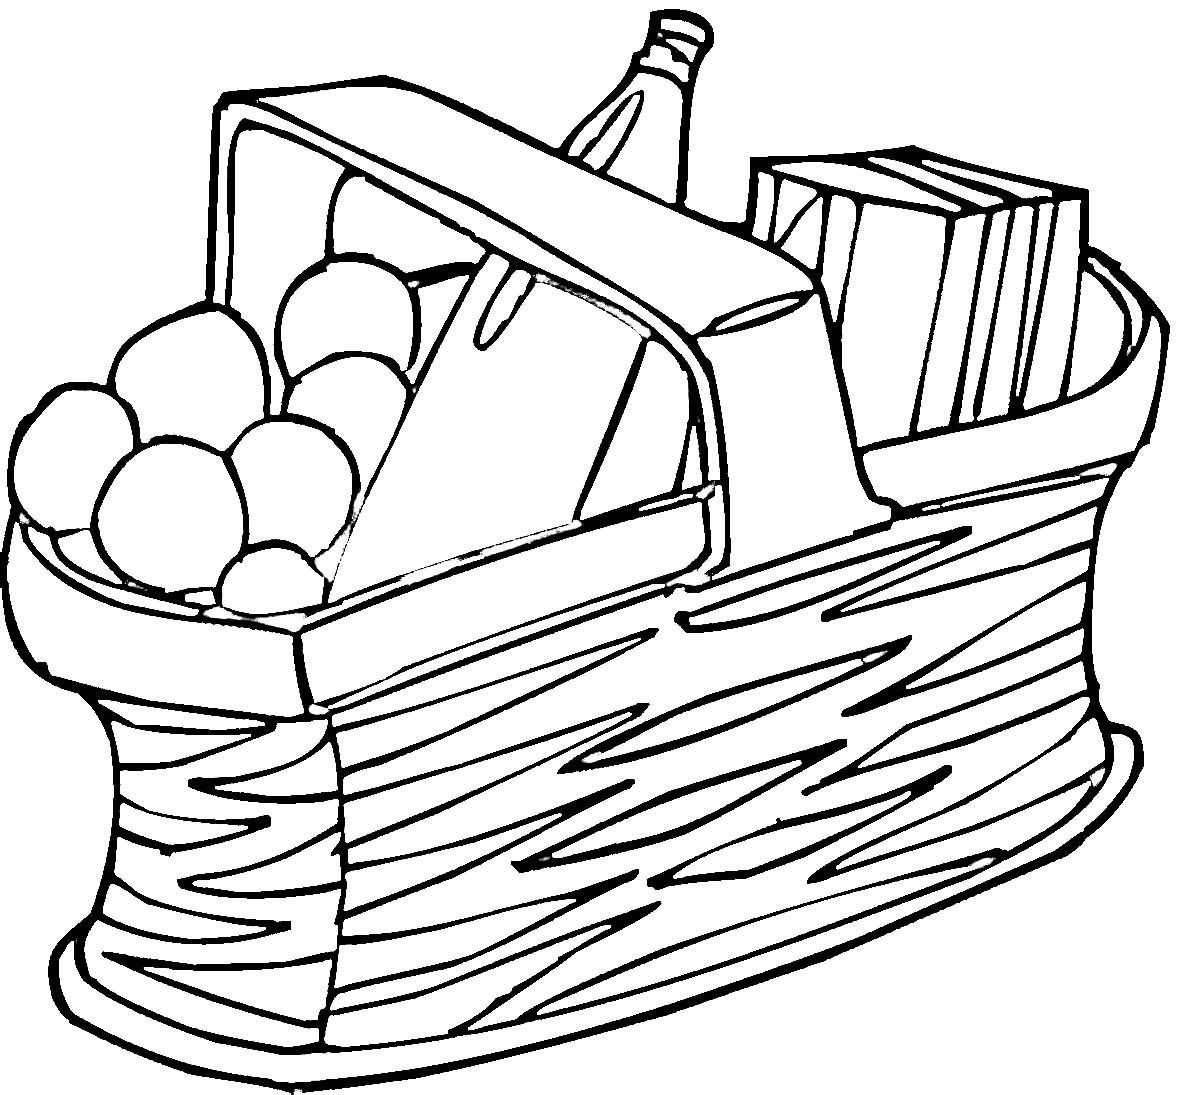 1200x1095 Picnic Basket Clipart Black And White Clipartfest 2